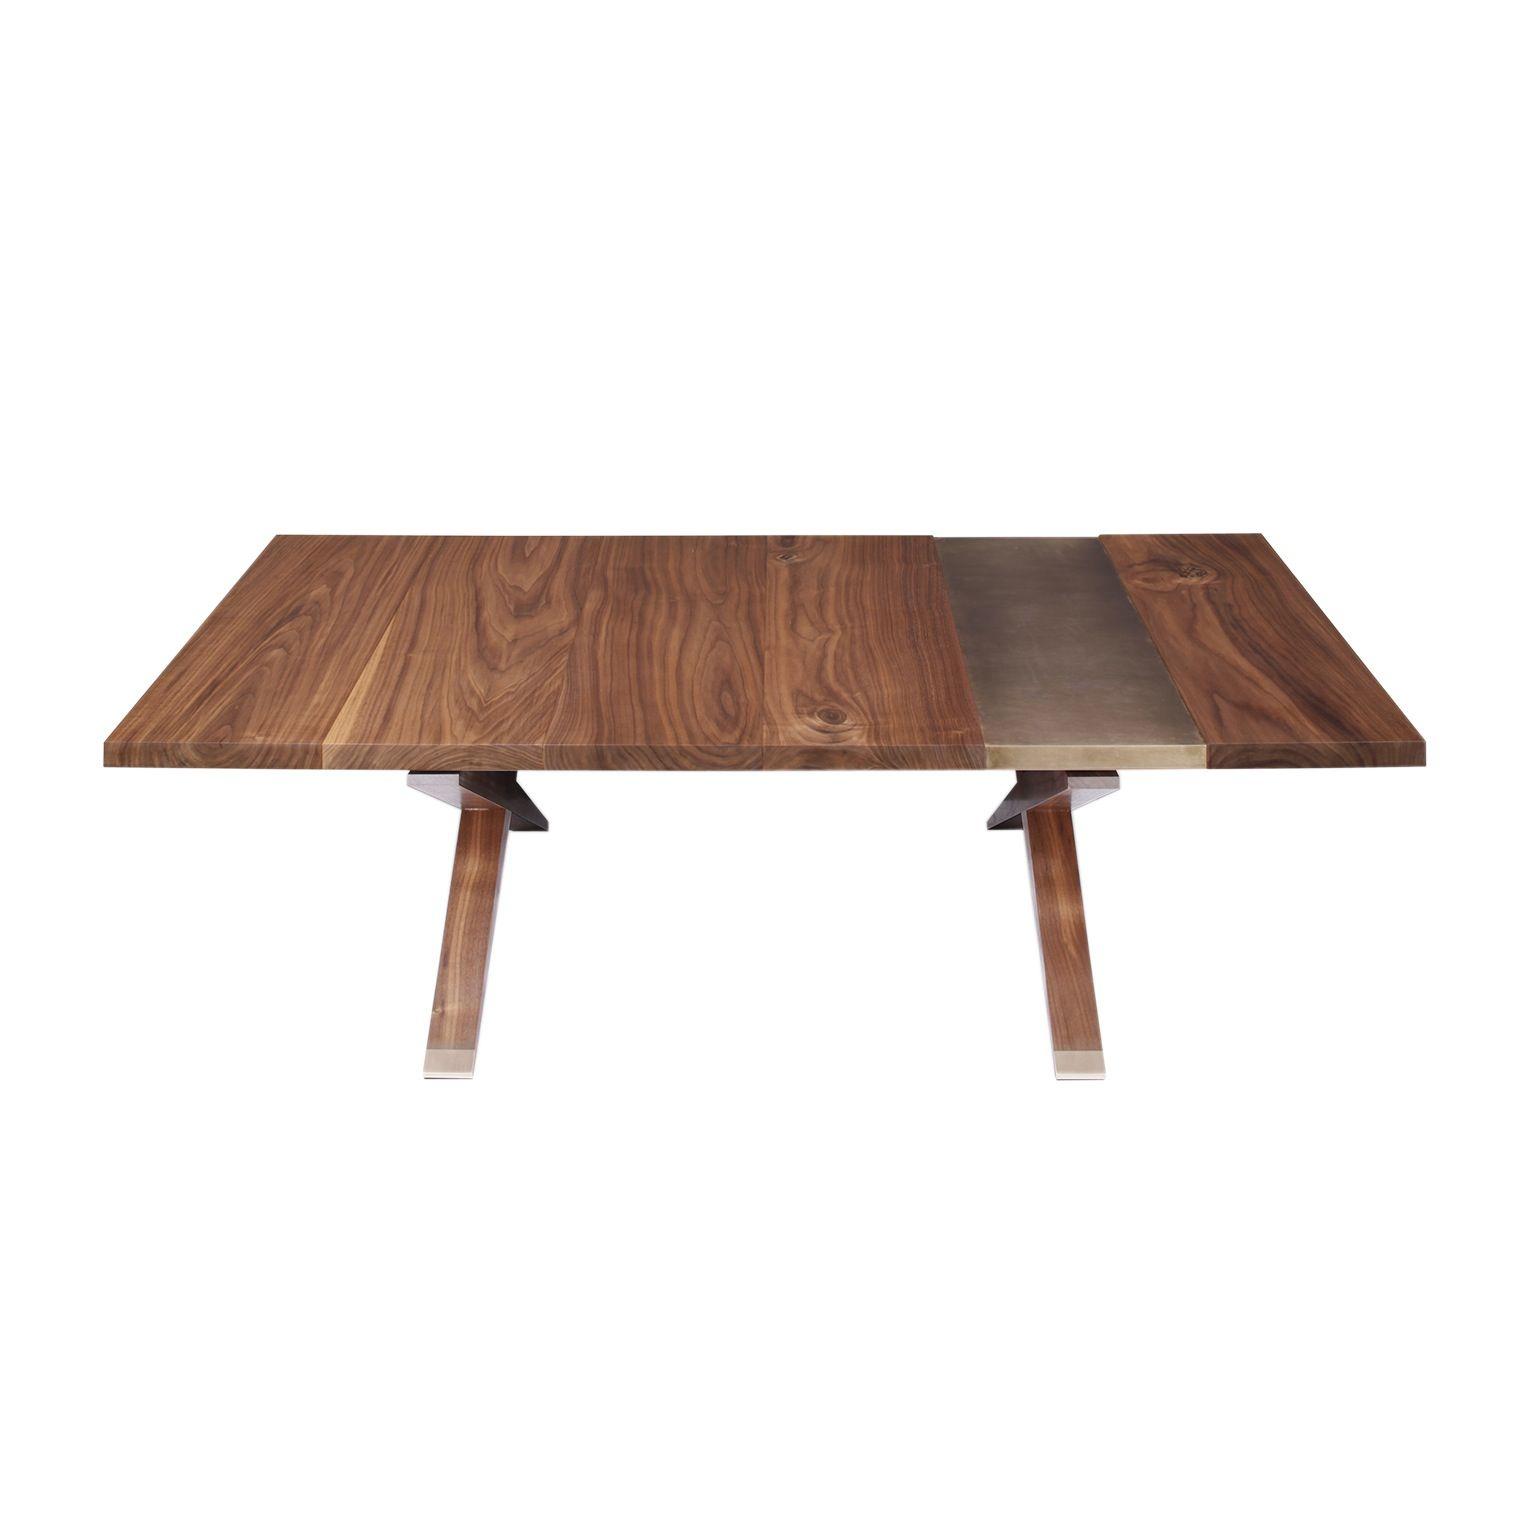 Dering Hall Coffee table, Walnut coffee table, Table